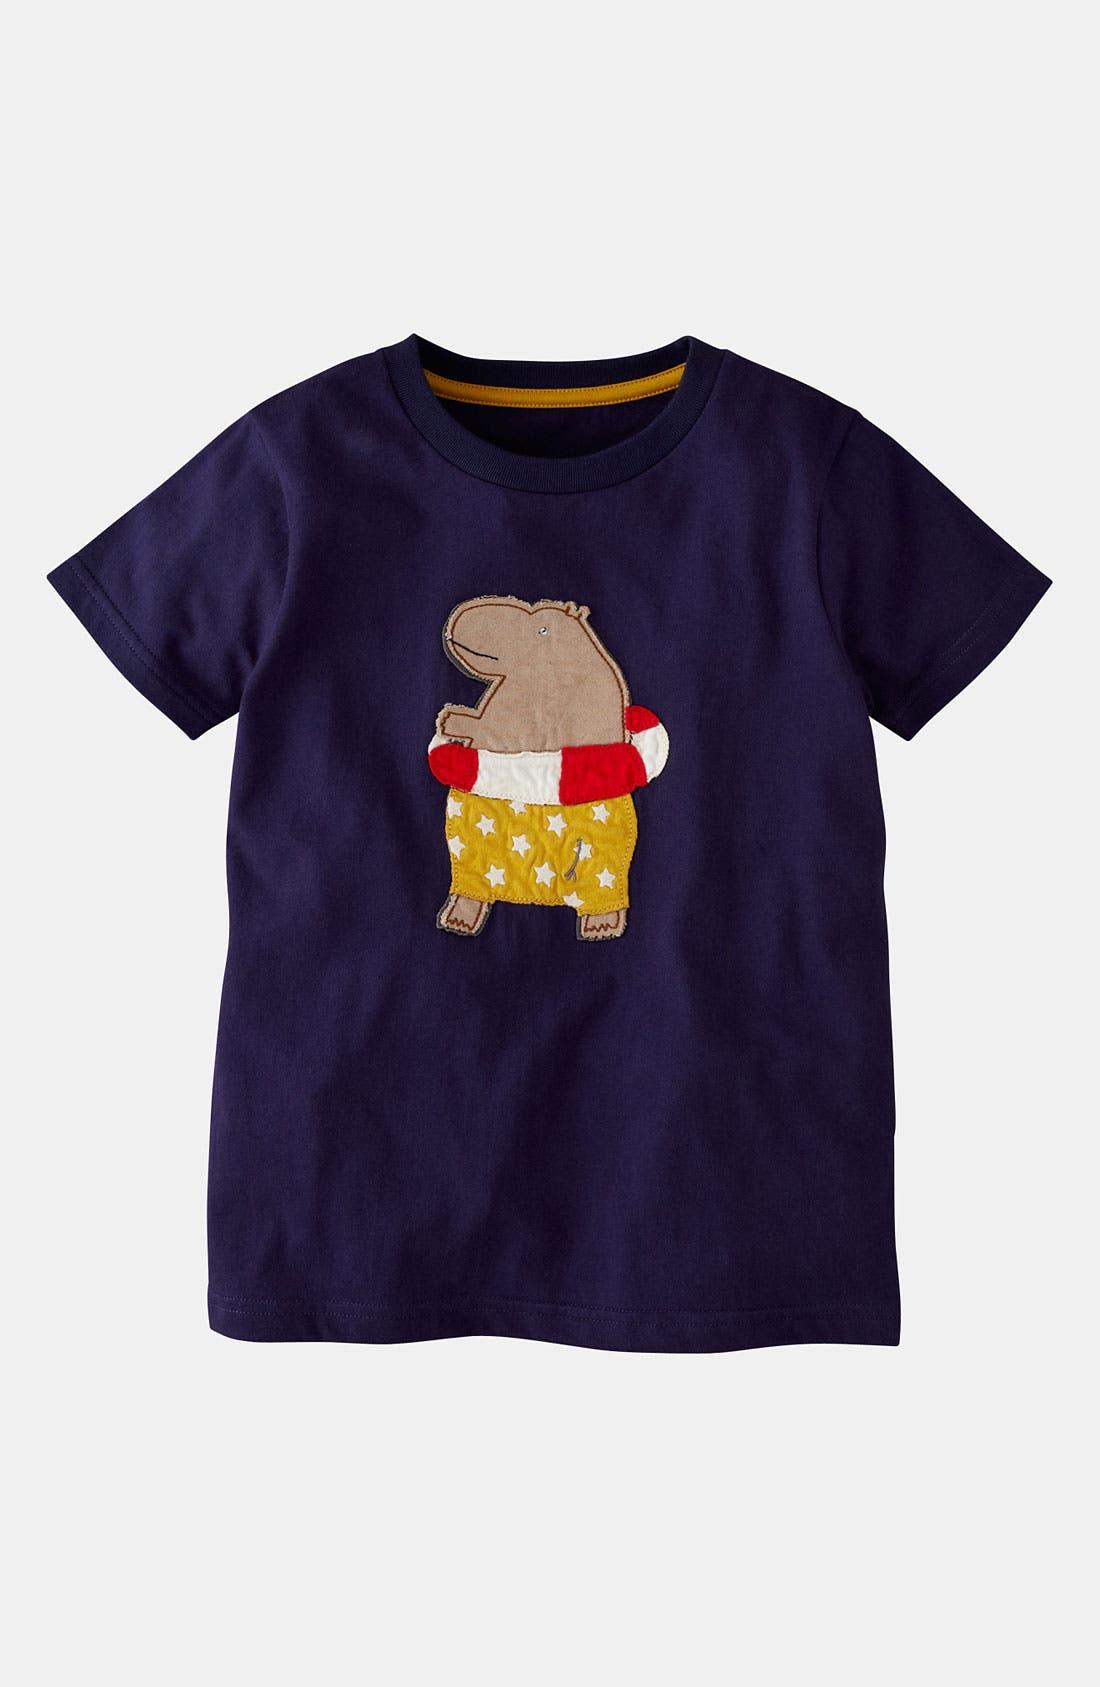 Alternate Image 1 Selected - Mini Boden 'Rock' T-Shirt (Big Boys)